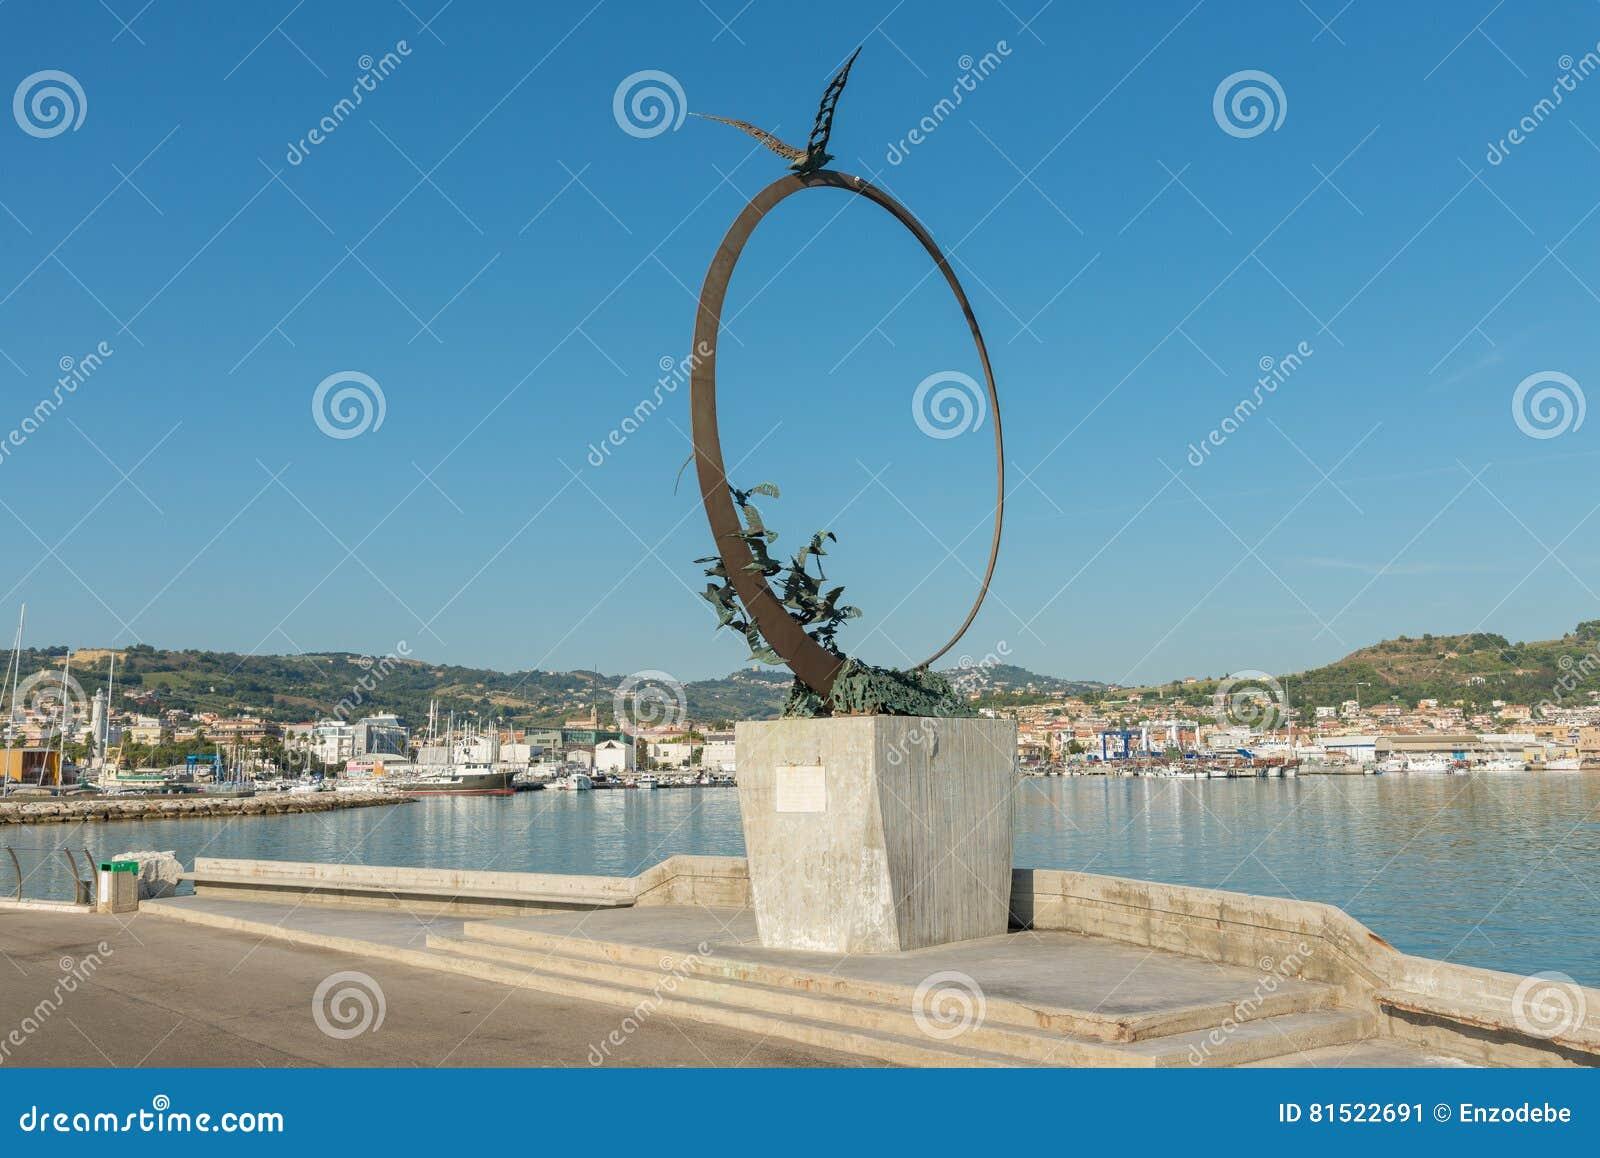 Monument Jonathan Livingston - S Bendetto del Tronto - IT